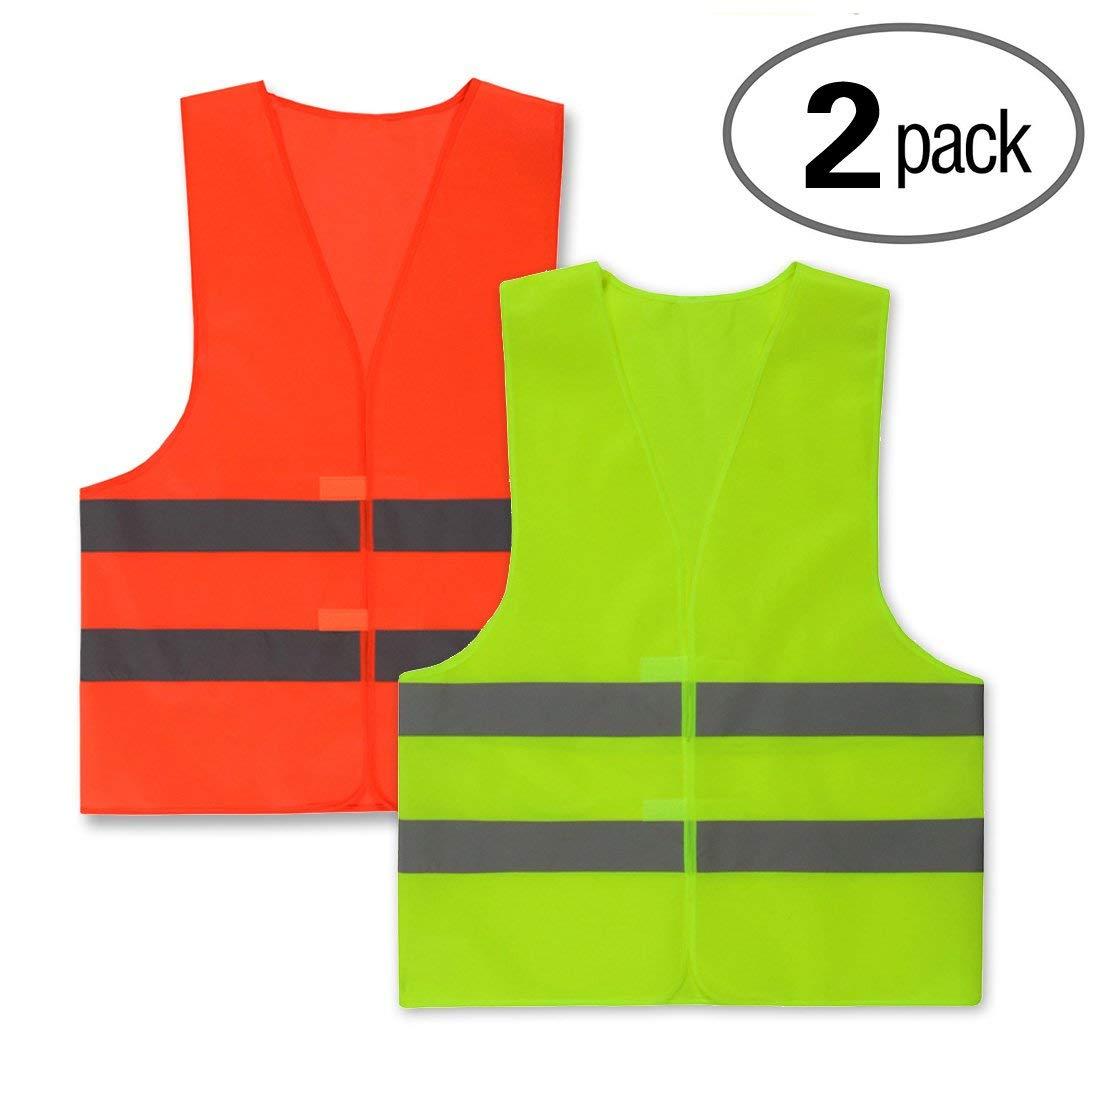 Pvc Reflective Tape Safety Reflective Vest Highways Sanitation Reflective Mesh Vests Security & Protection